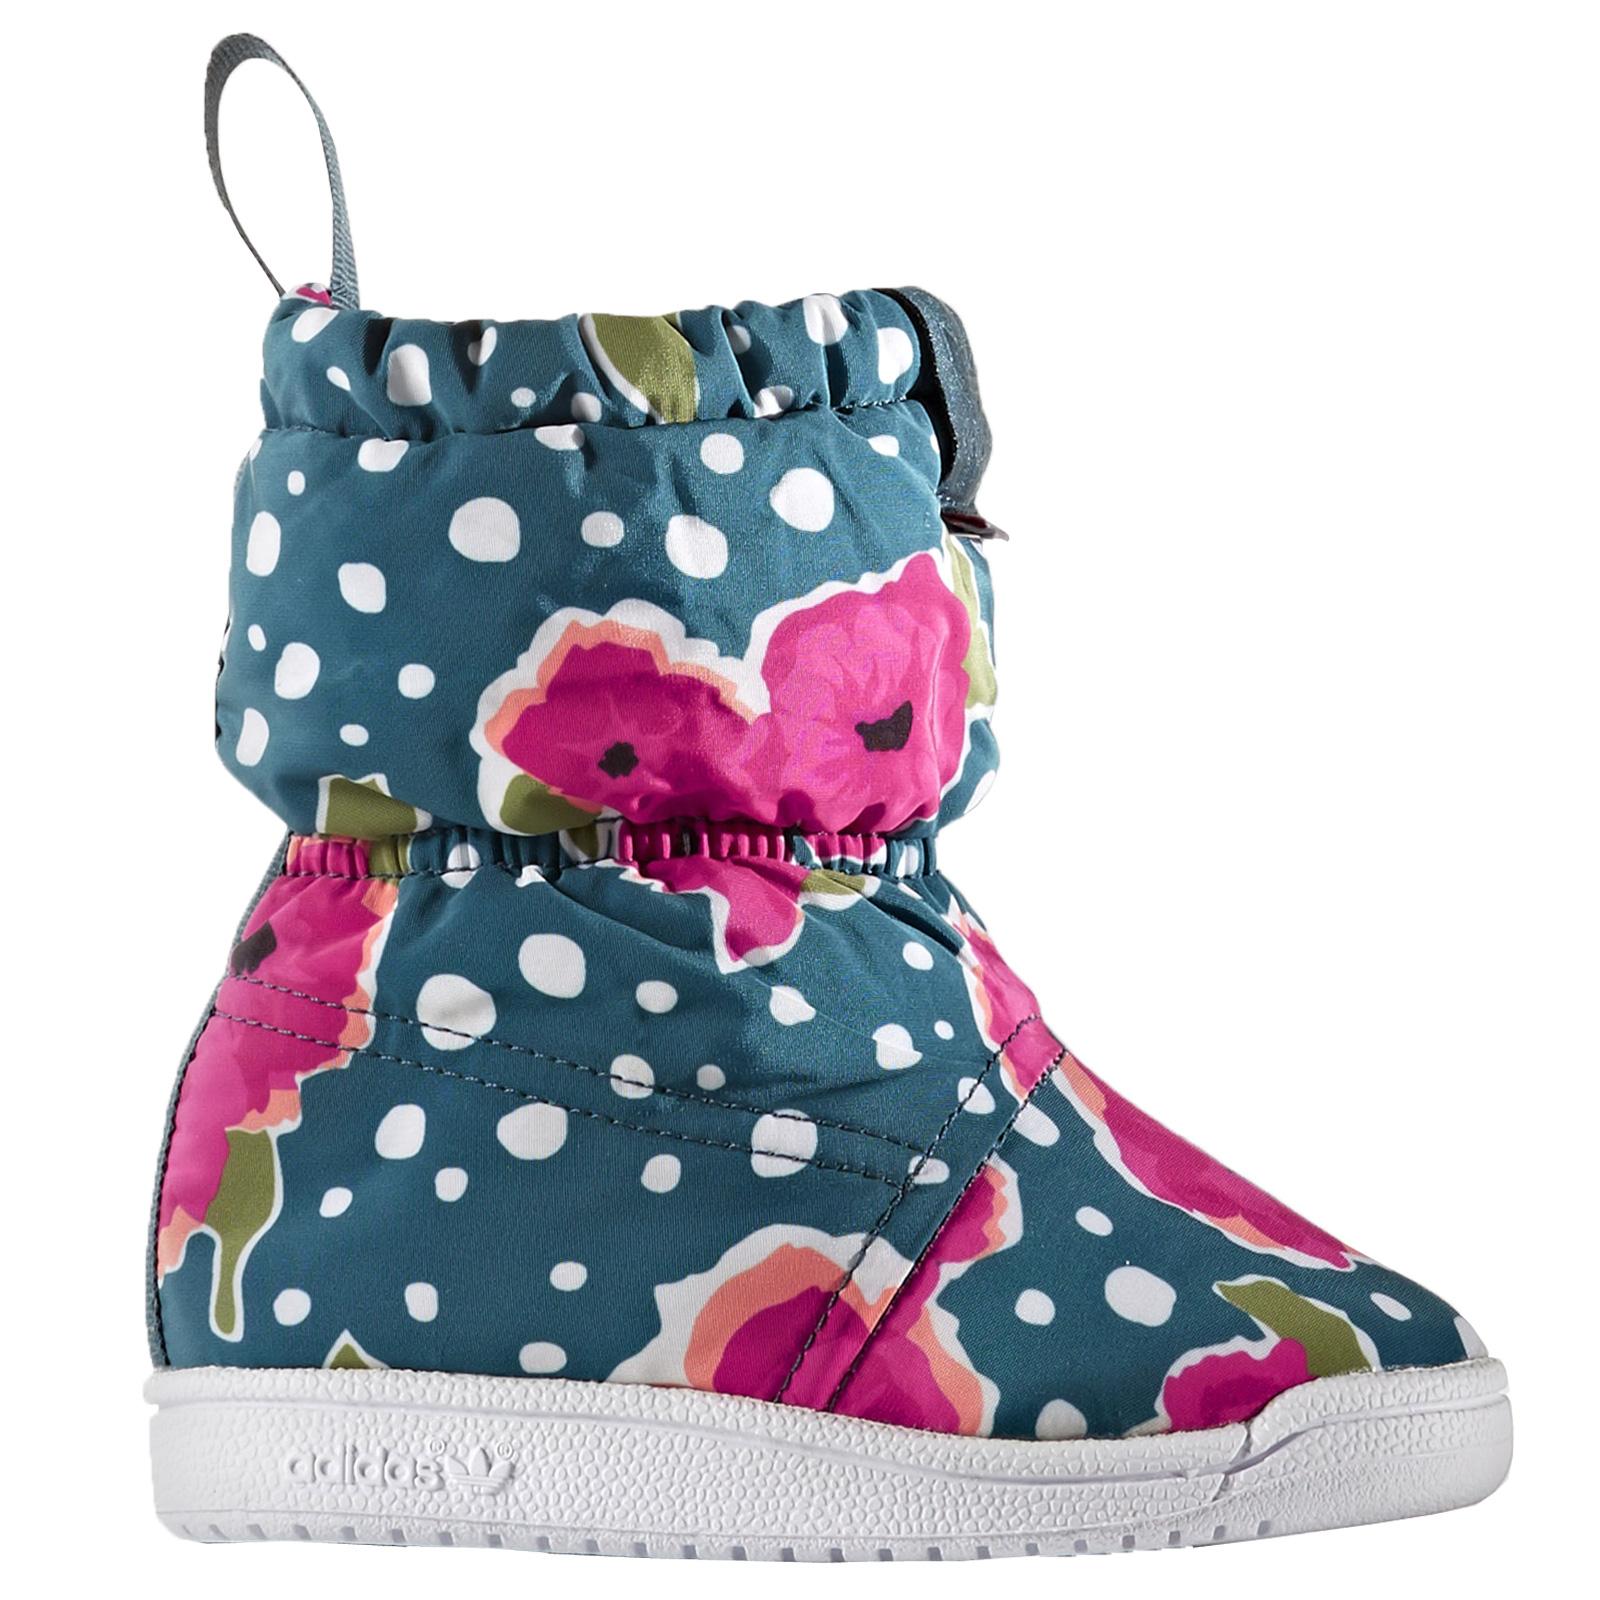 buy online 5e569 7bdd1 adidas Baby Winter Boot Kinder Schnee Stiefel Winterschuhe dick gefüttert  Blumen